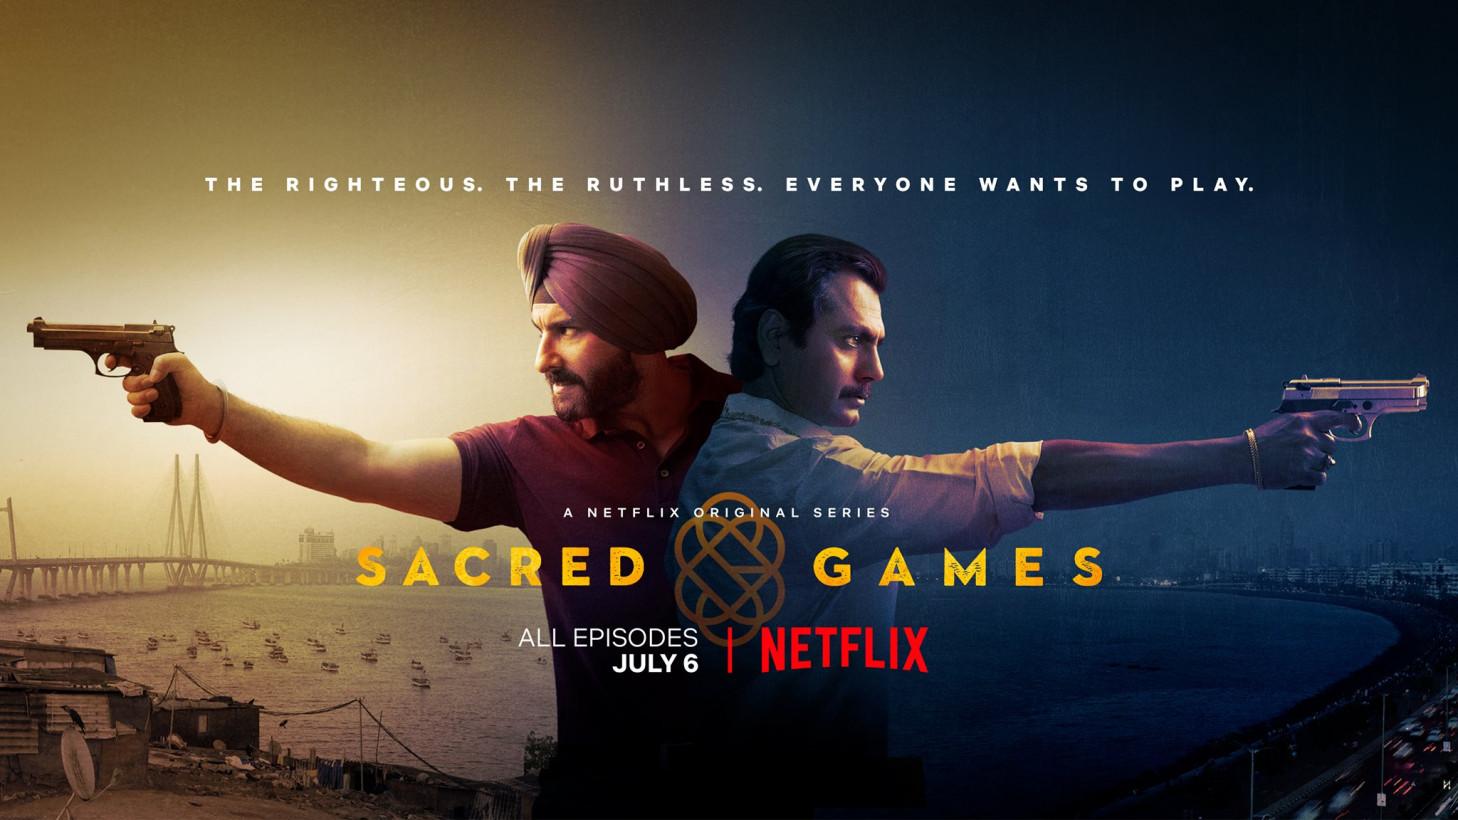 A promo image for Netflix' Sacred Games